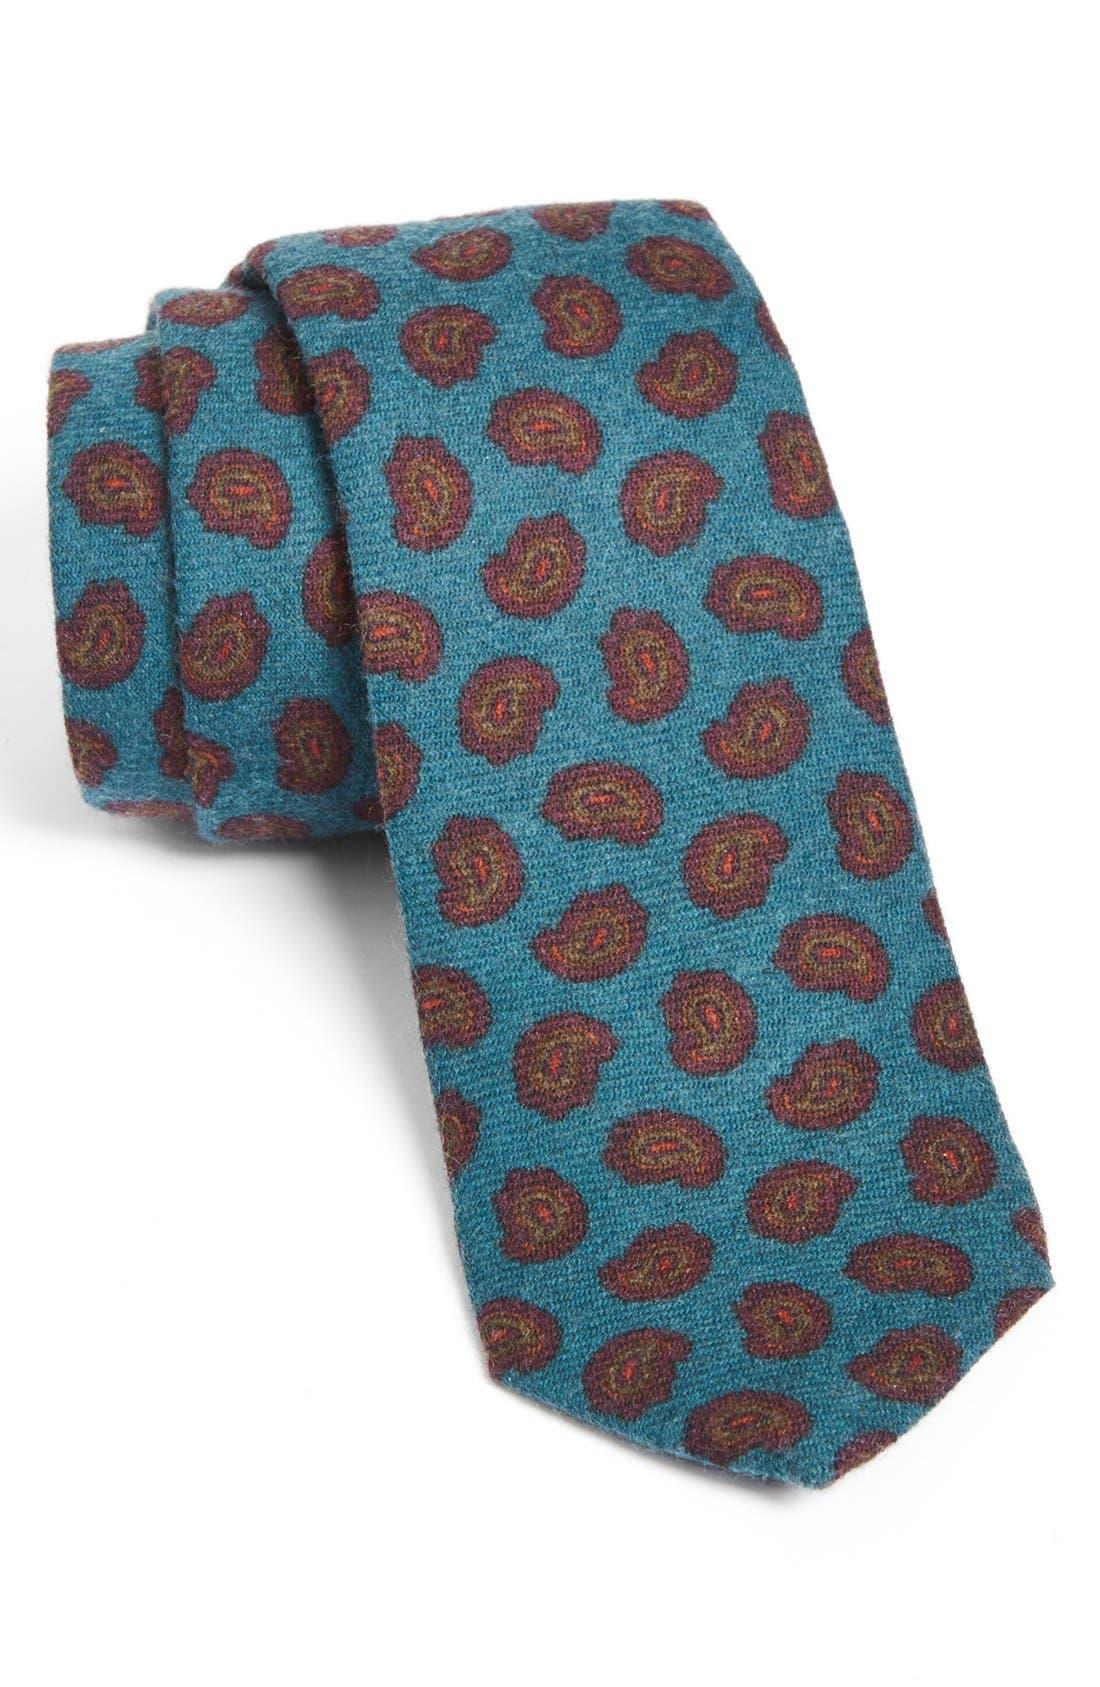 Alternate Image 1 Selected - Gitman Paisley Woven Wool Tie